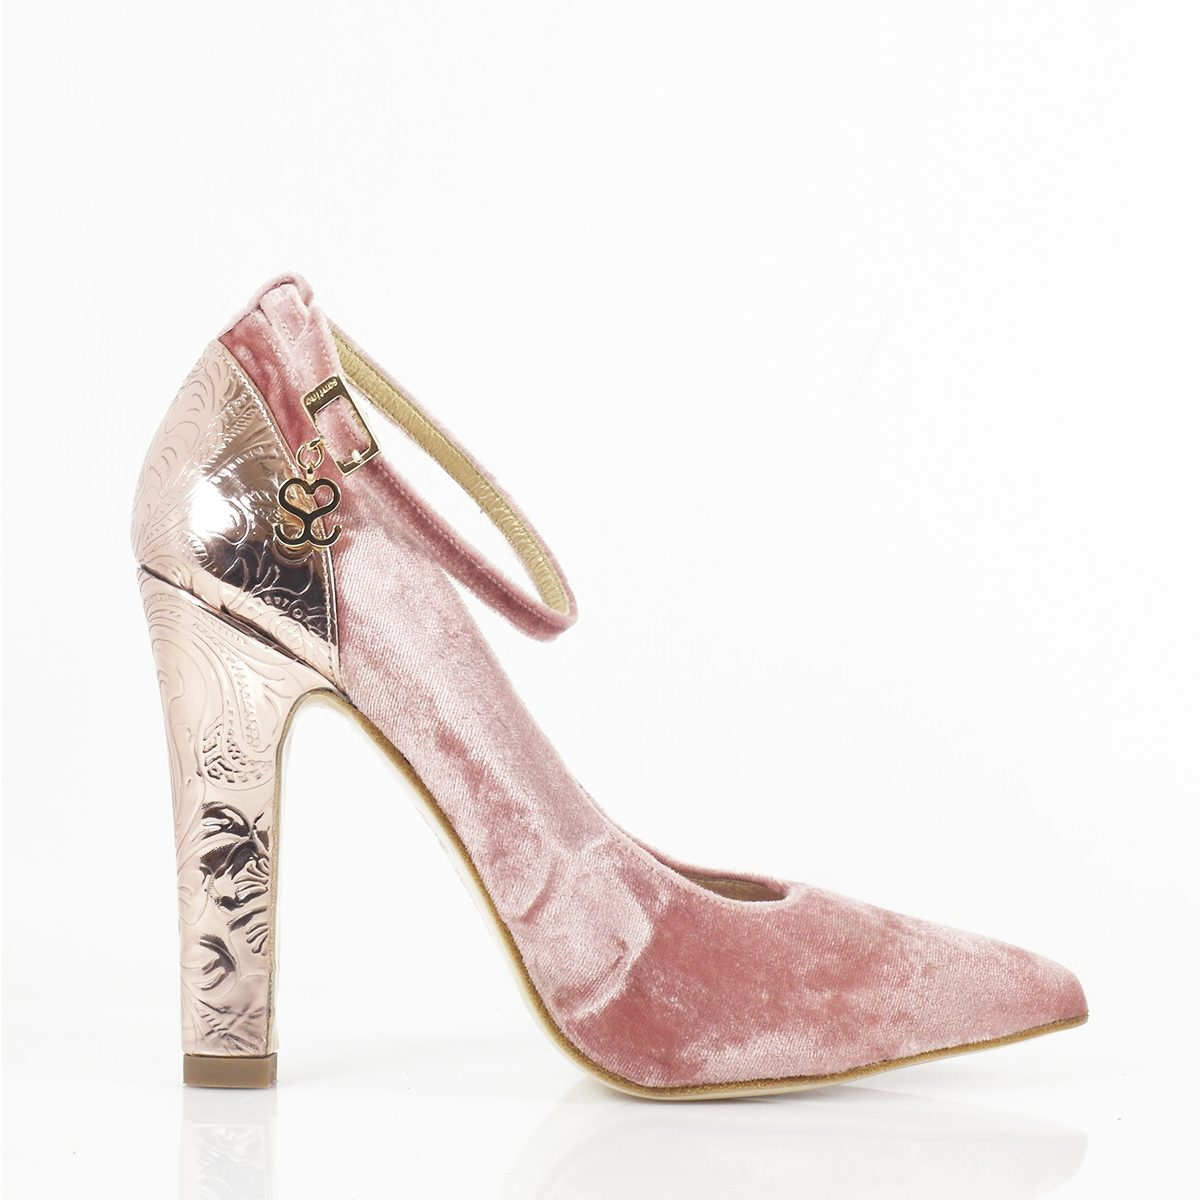 SALON MOD.1833 (10,5cm) - Zapatos Personalizados fiesta